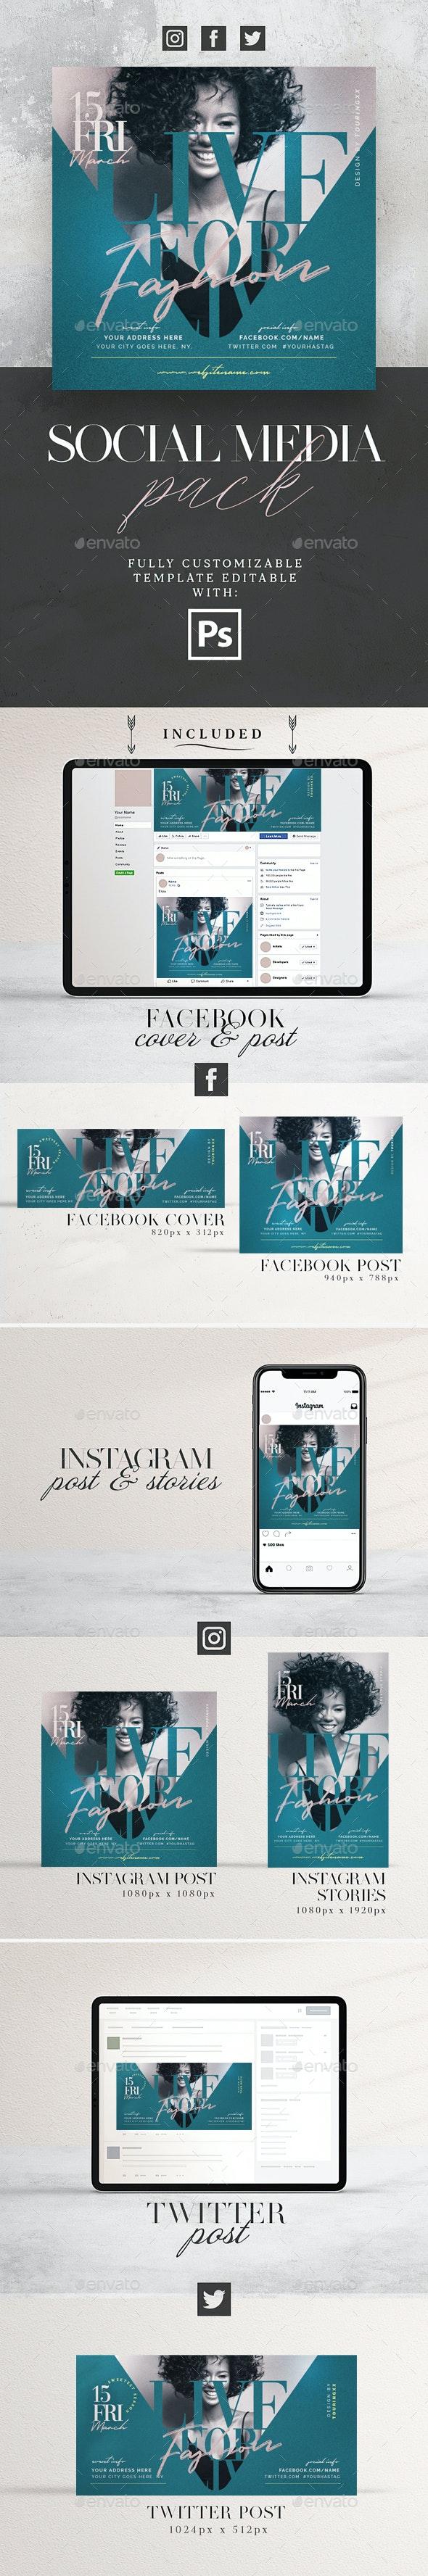 Live For Fashion Social Media Pack - Social Media Web Elements